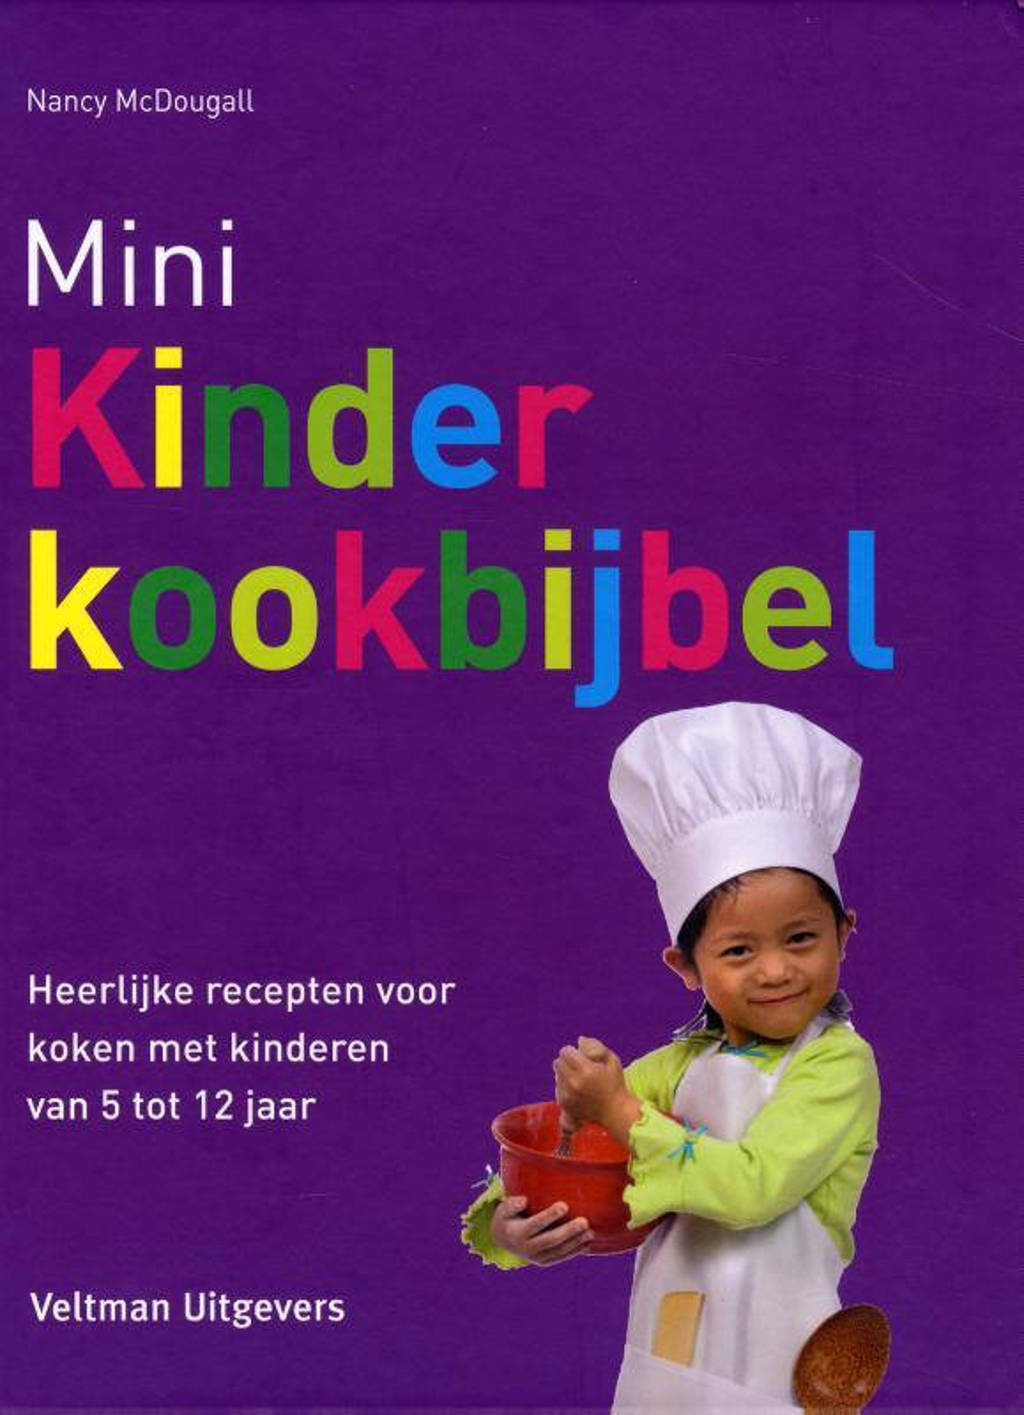 Mini Kinderkookbijbel - Nancy McDougall